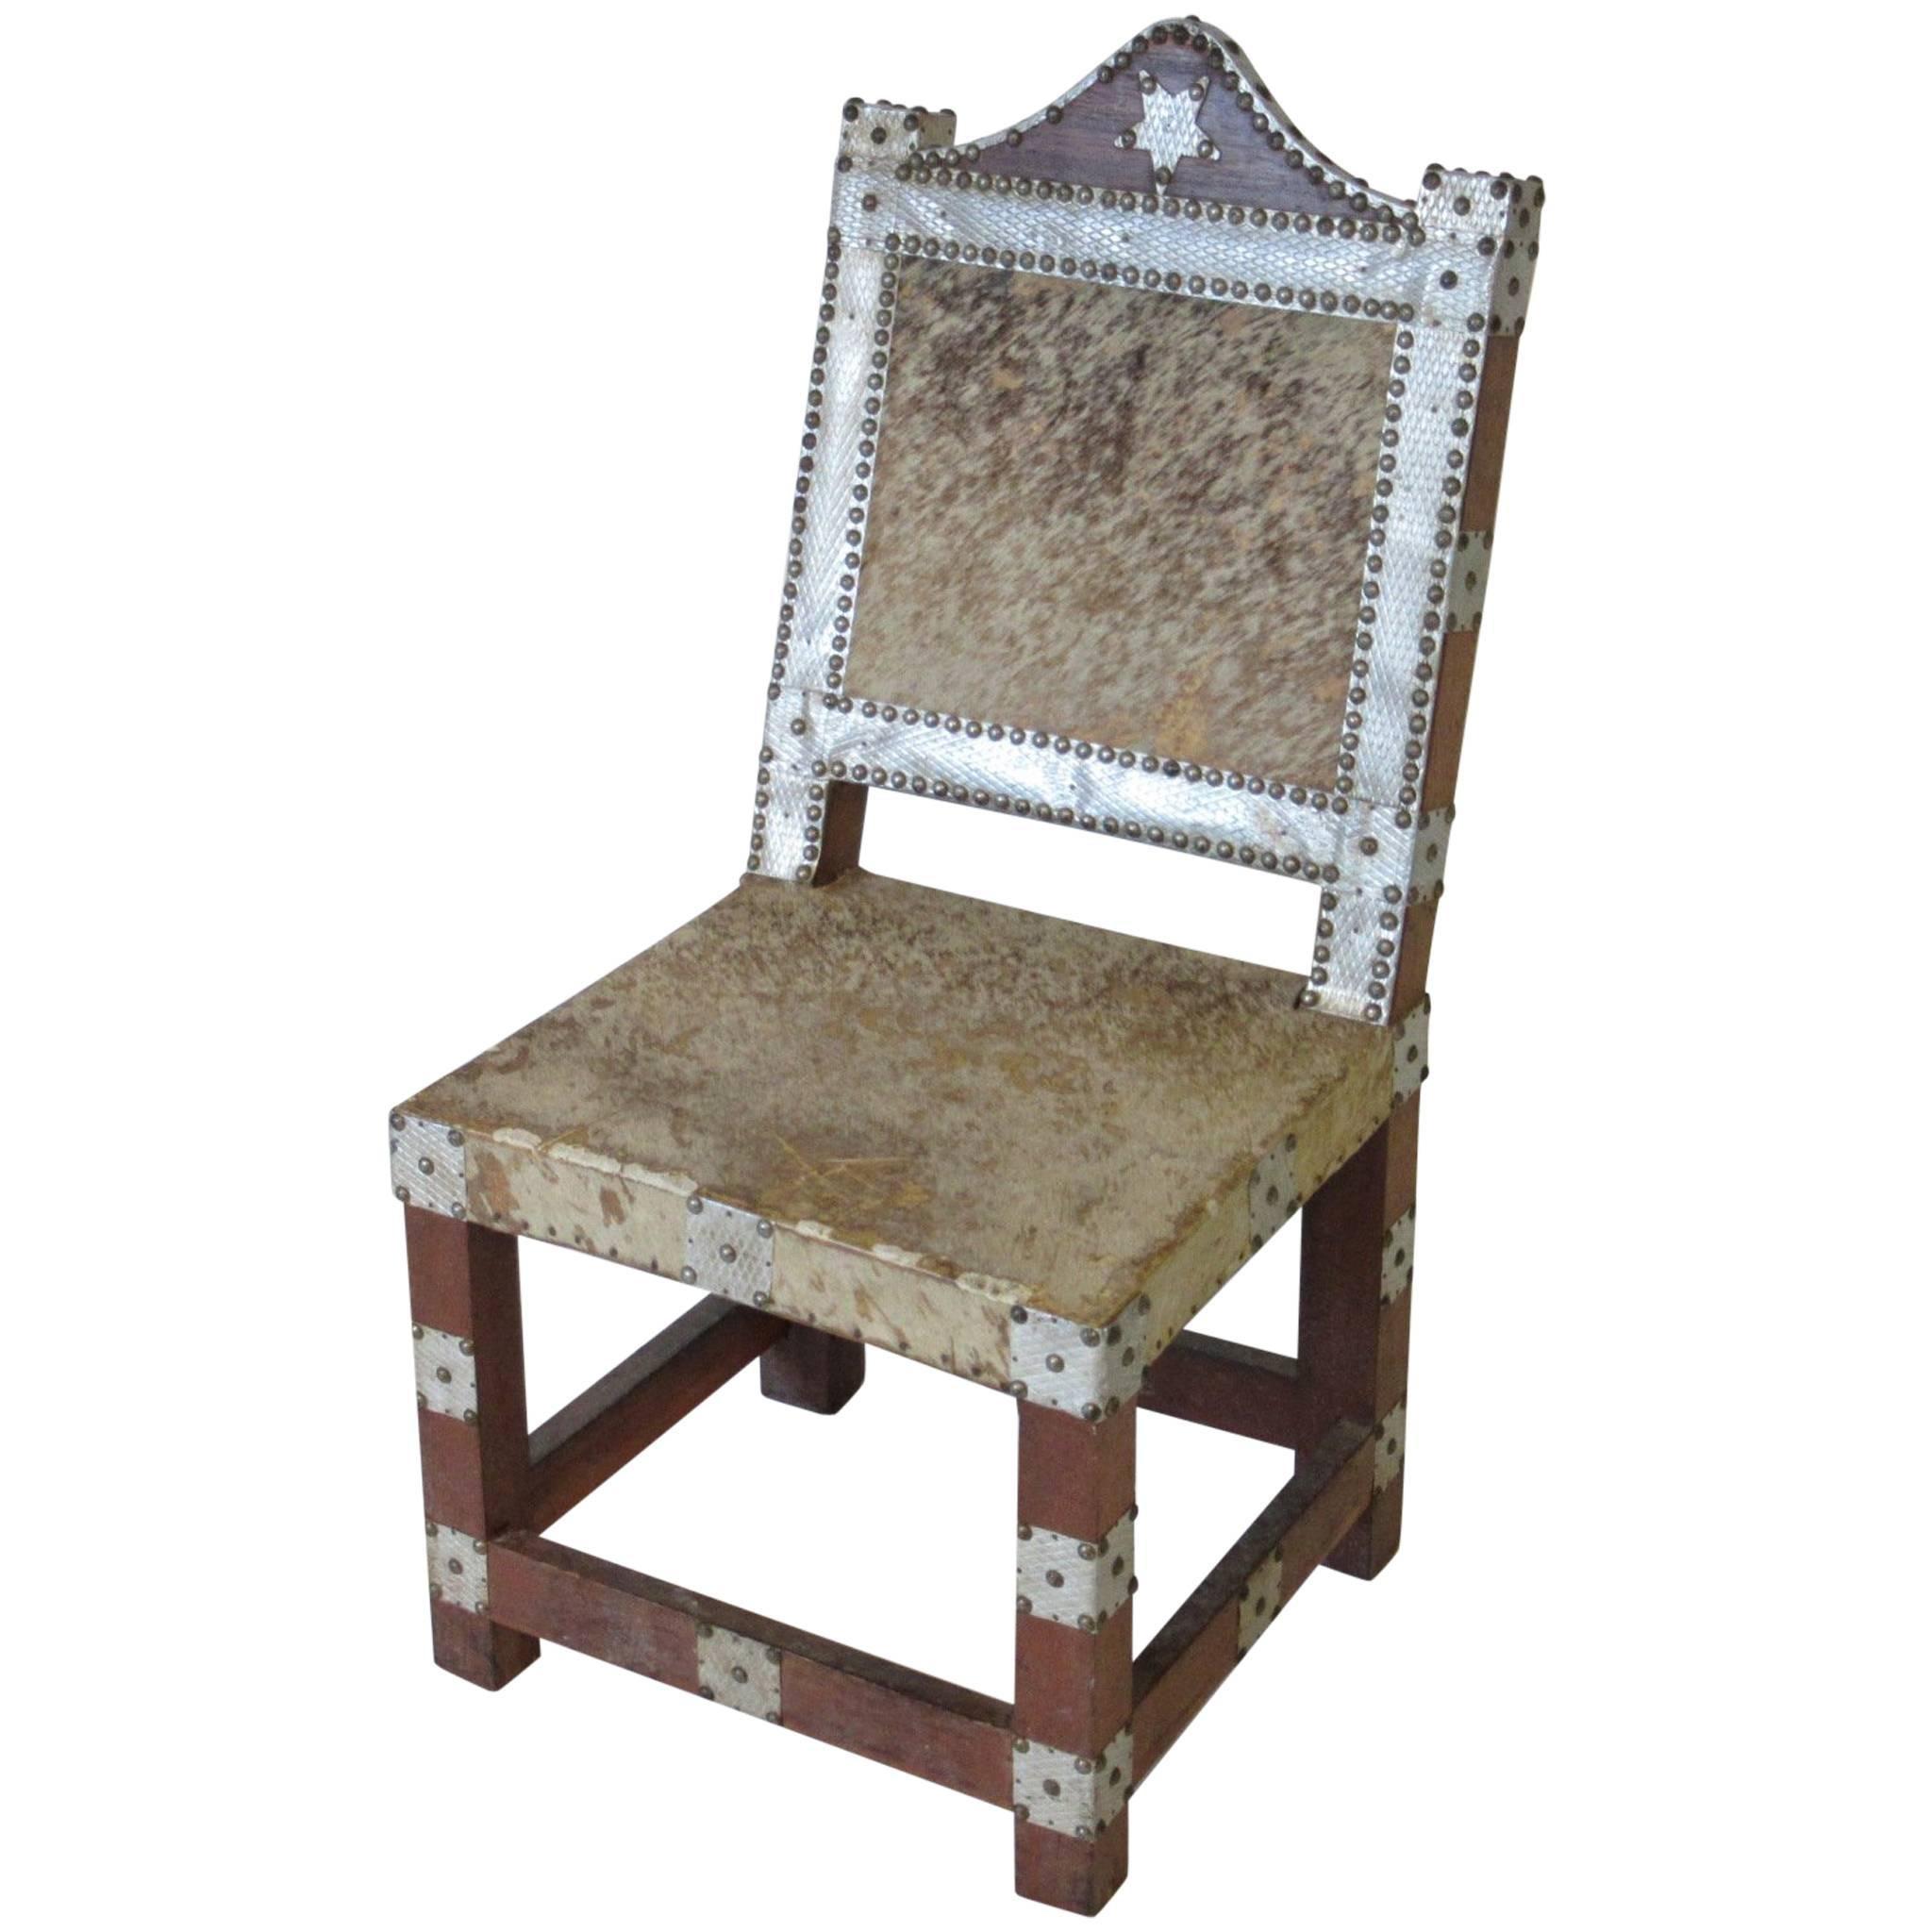 Folk Art African Royal or Prince Aluminum and Metal Studded Animal Skin Chair